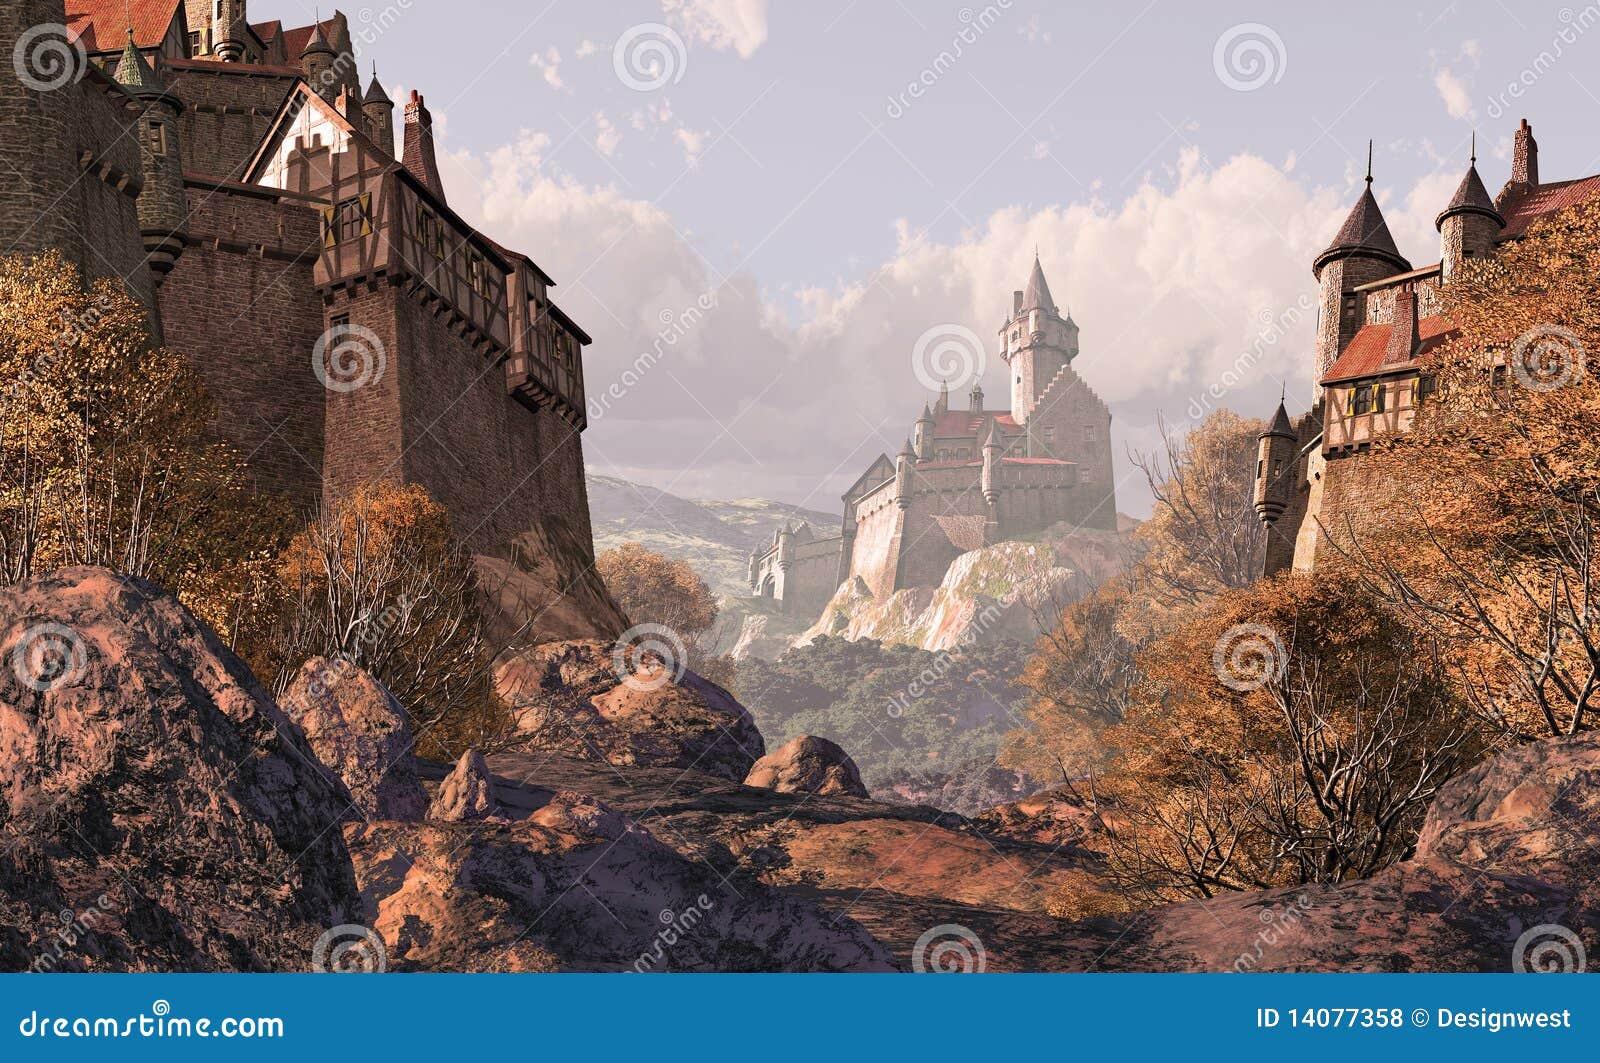 Village Castle In Medieval Times